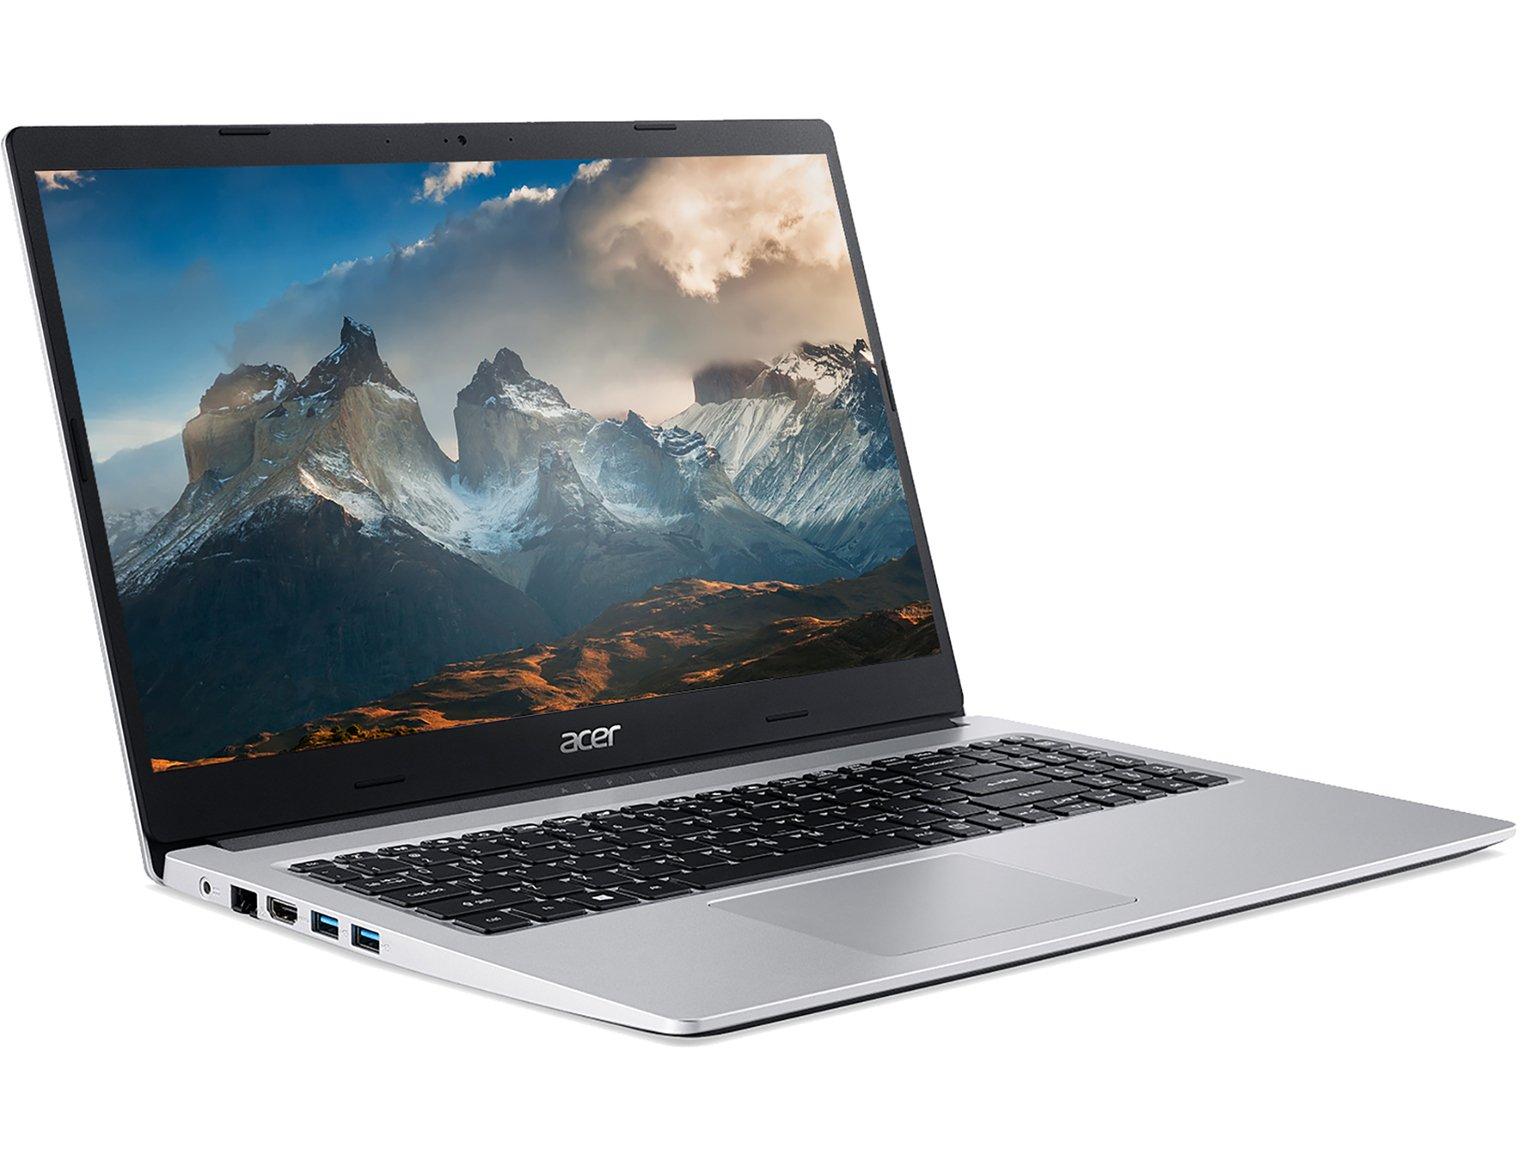 Acer Aspire 3 15.6in AMD 3020e 4GB 1TB Laptop - Silver